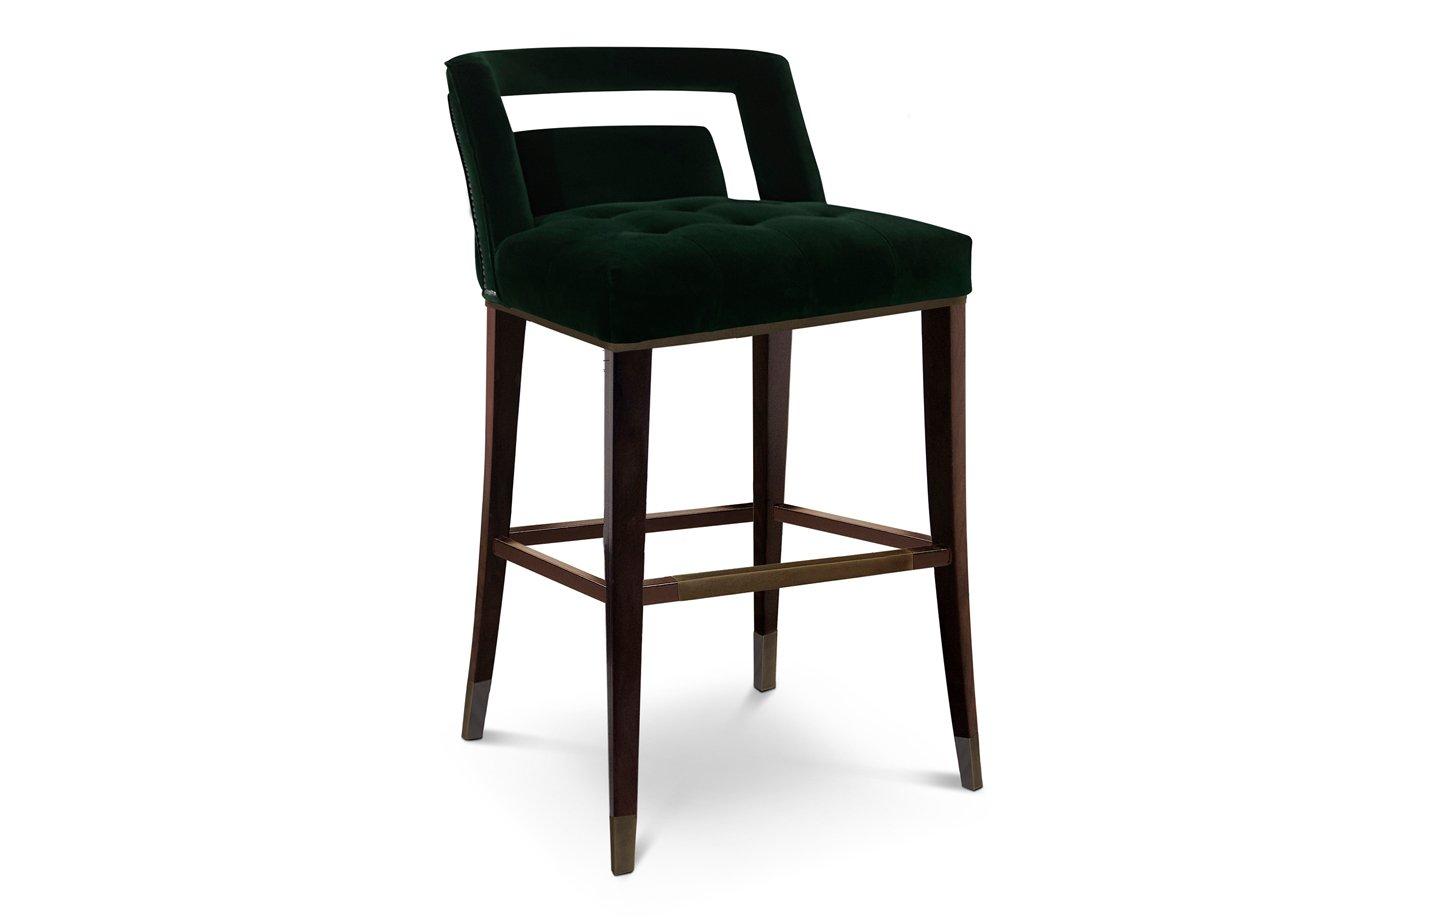 Naj bar chair – Green